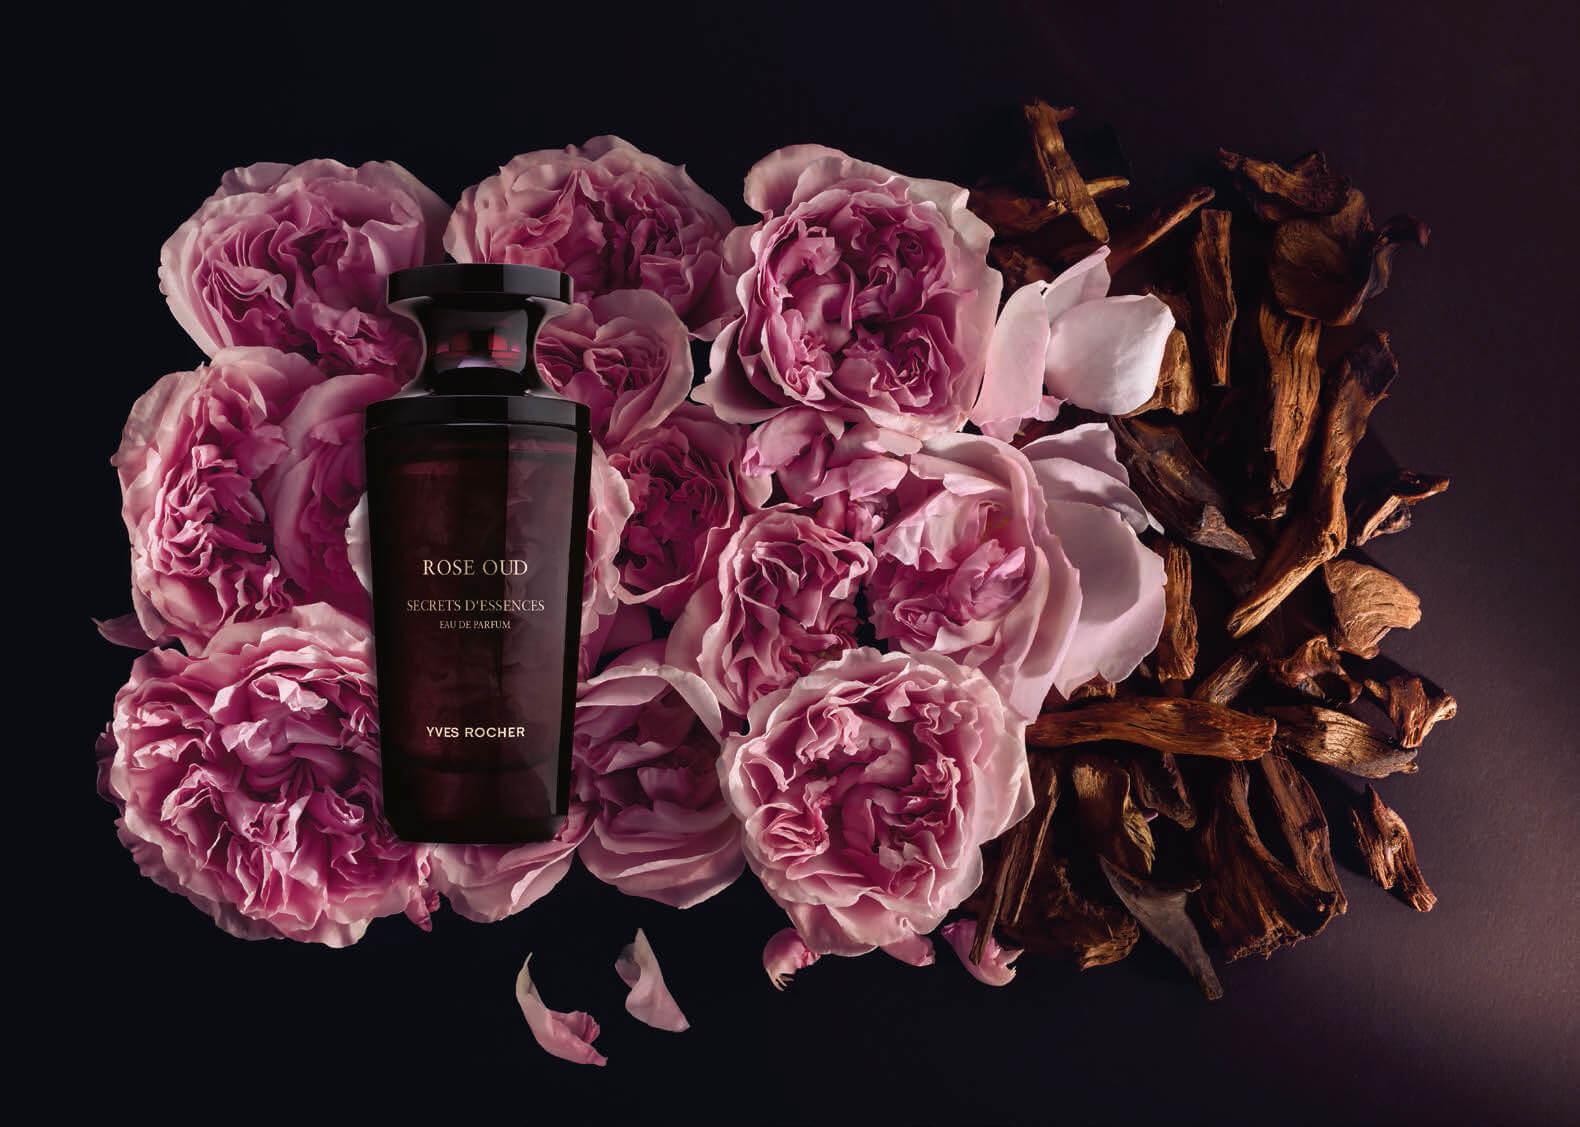 Парфюмы Yves Rocher − ароматы года по версии Fragrantica-320x180